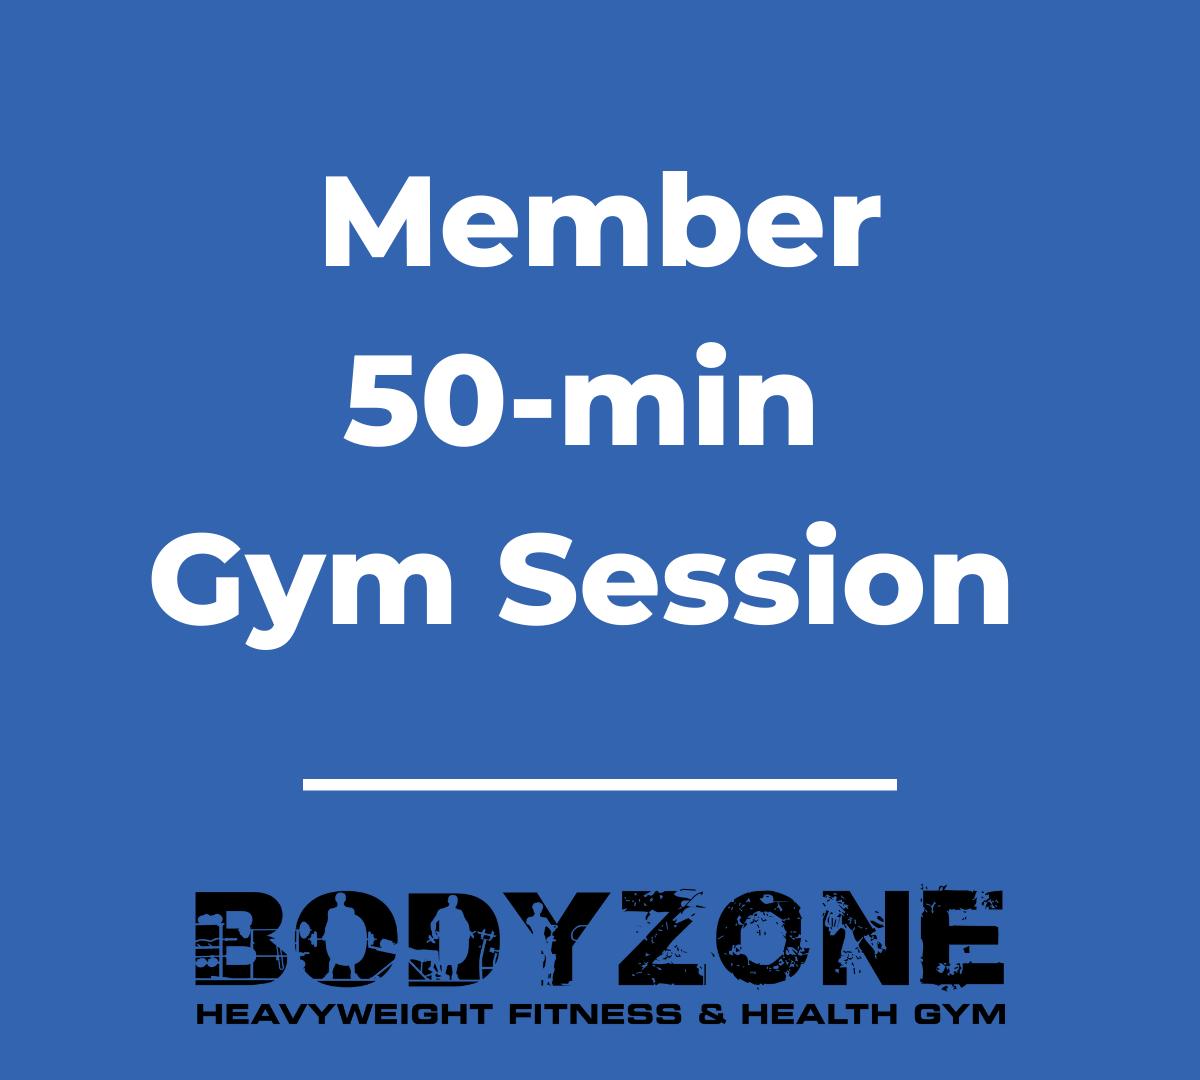 50-min Member Gym Session